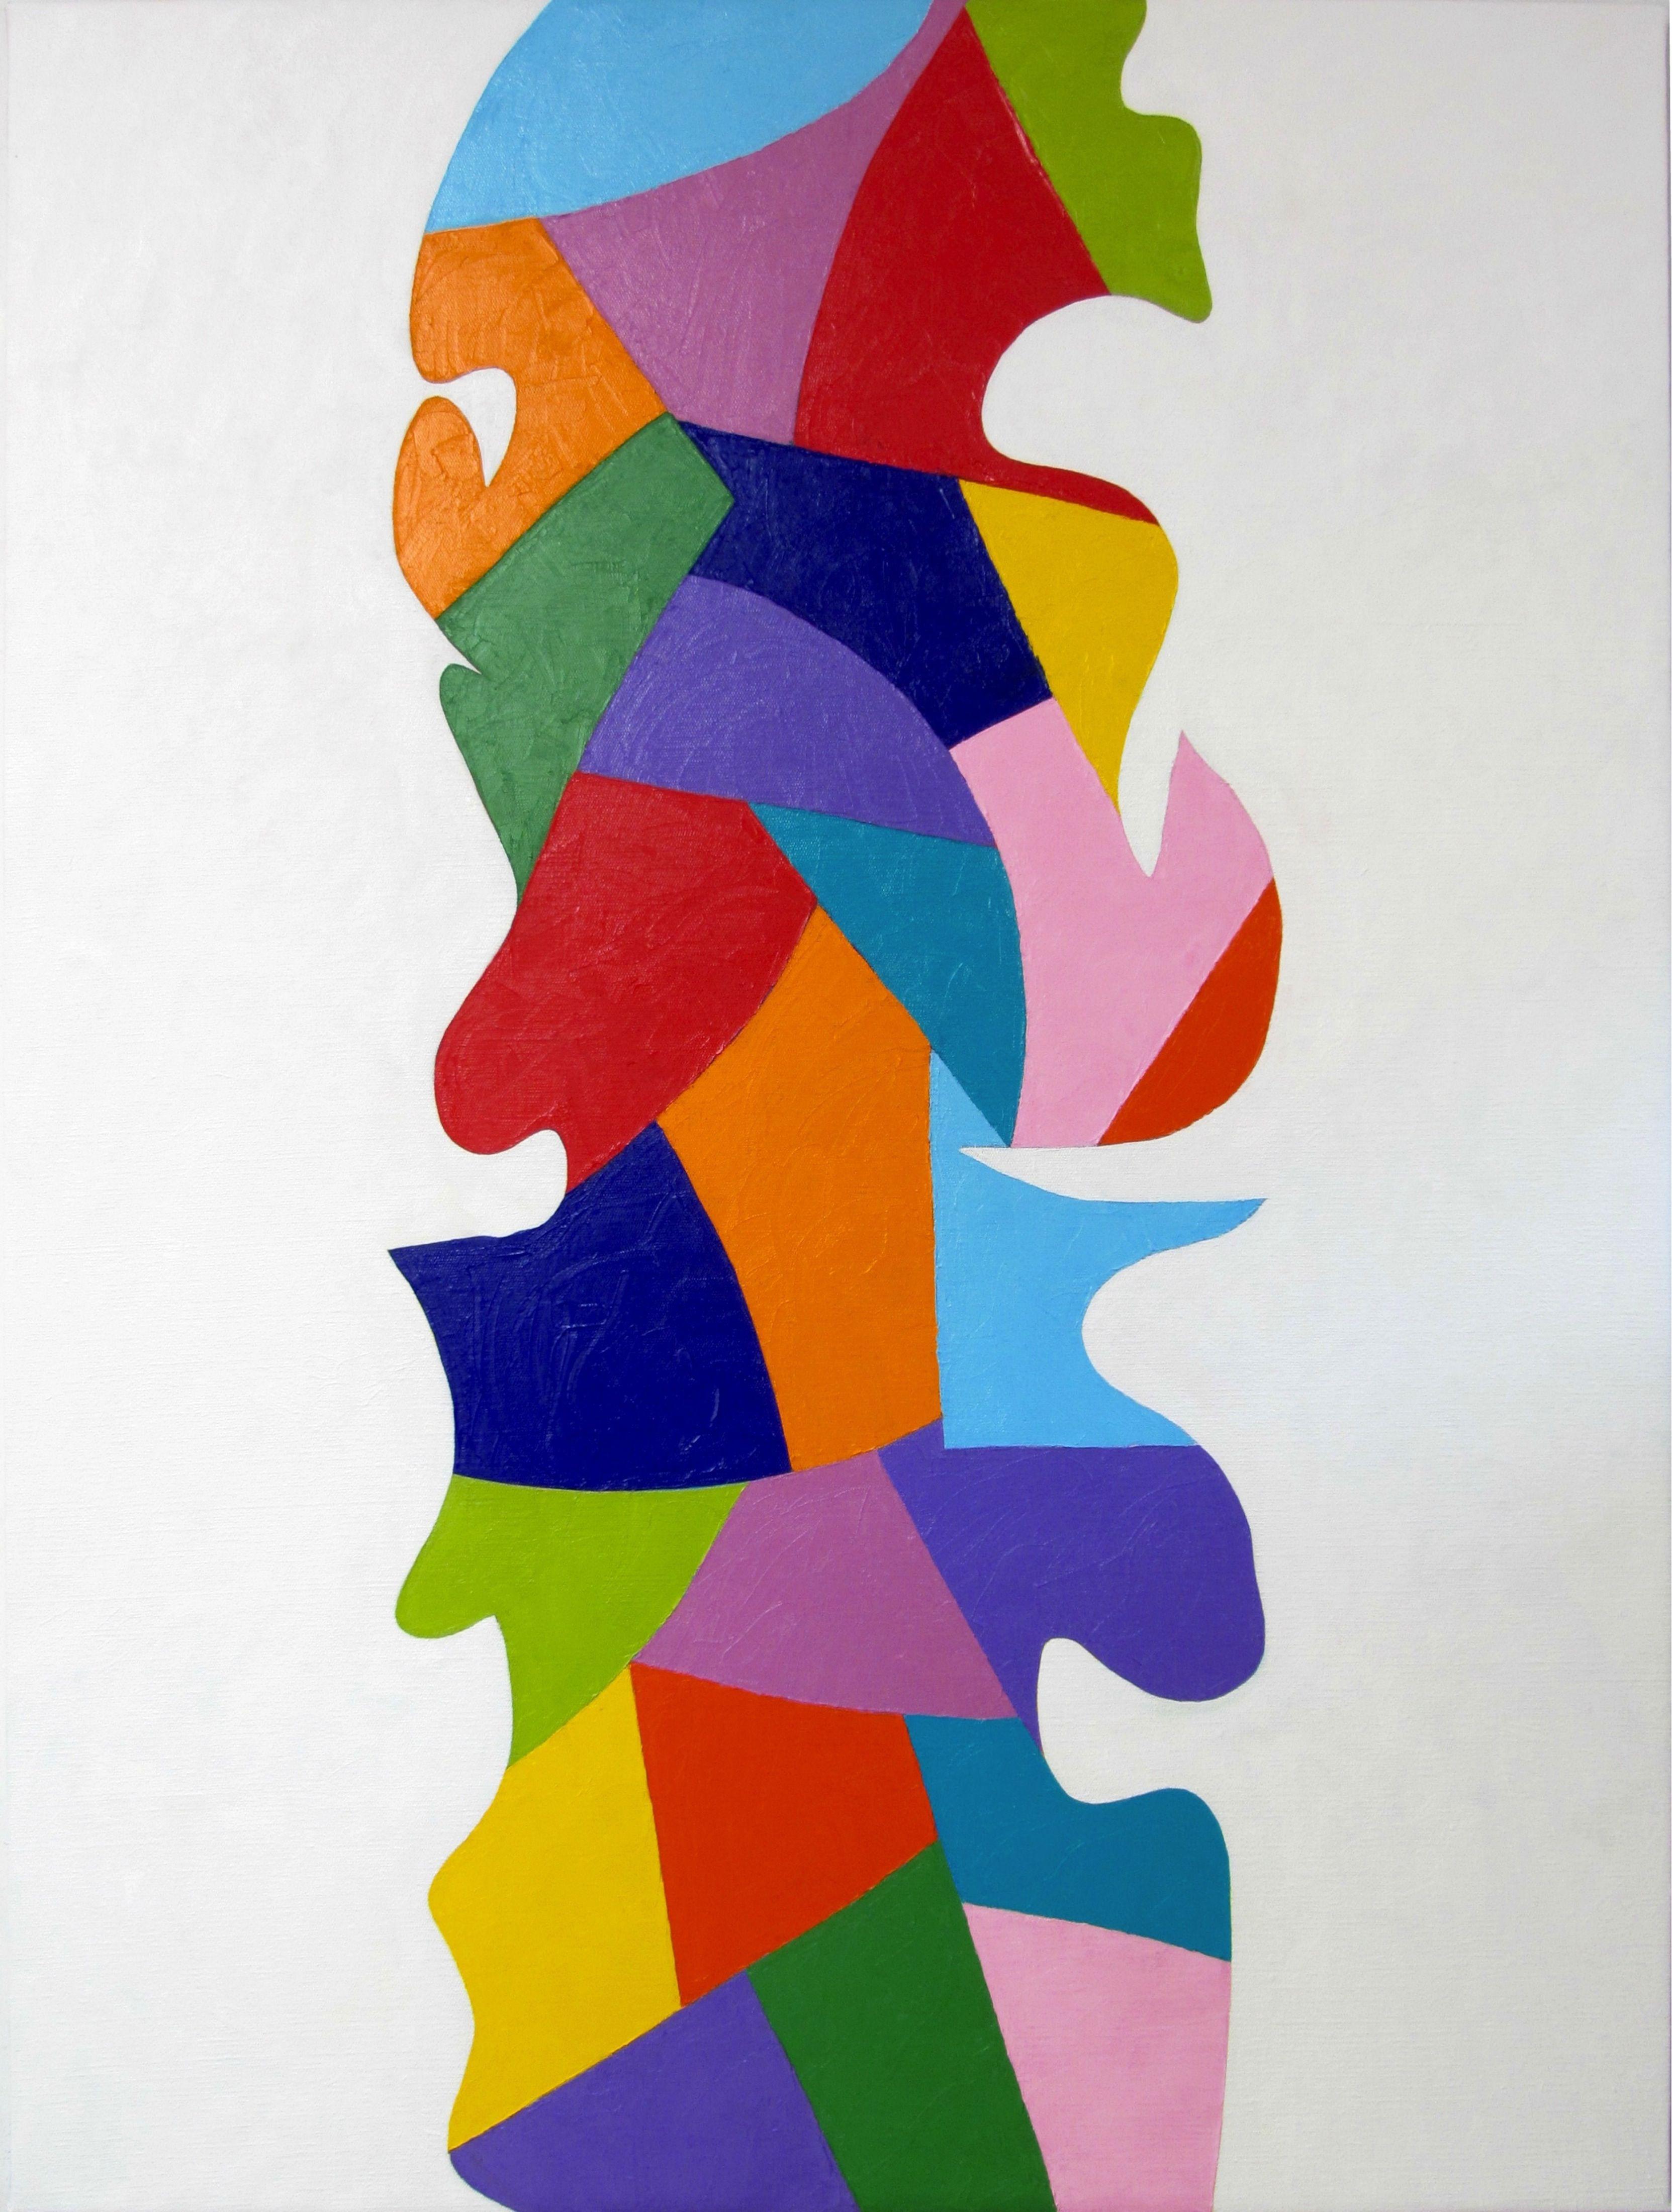 Dana Gordon, Endless Painting 3